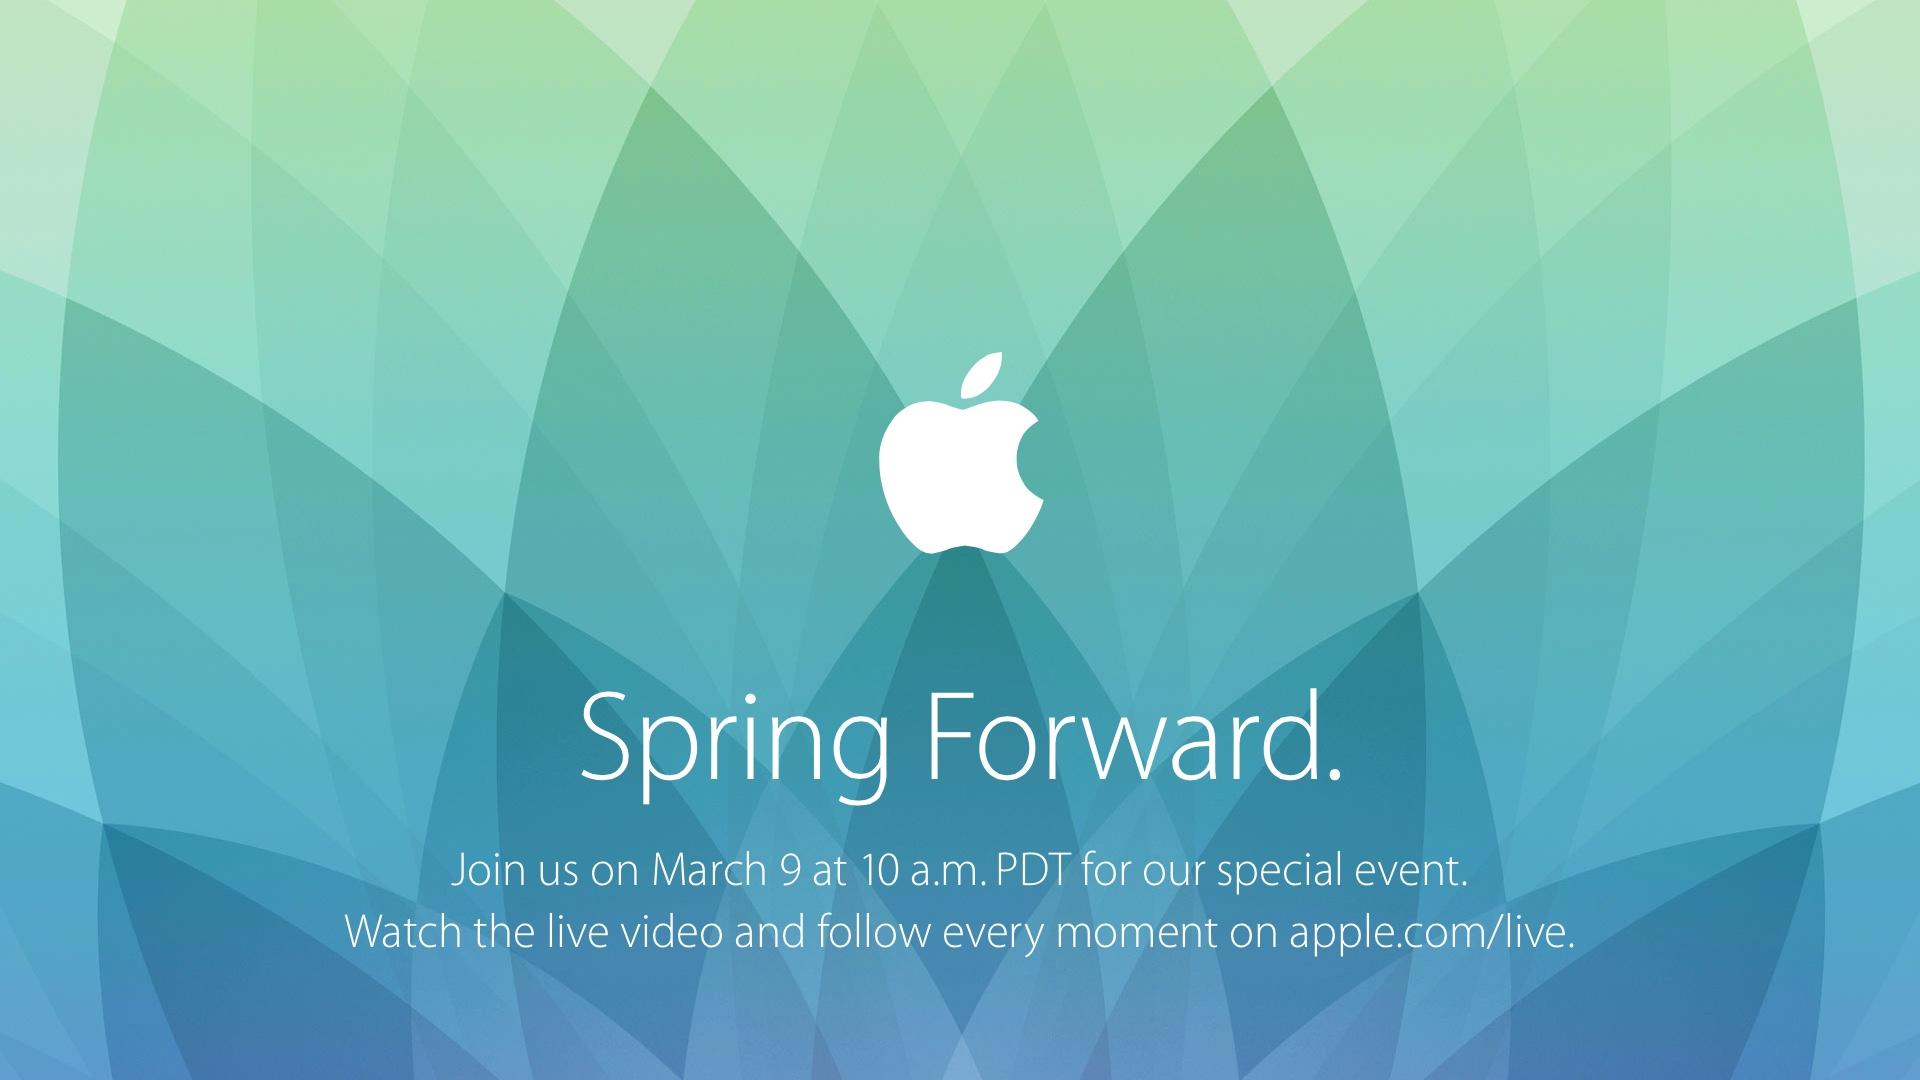 Apple March 2015 Spring Forward